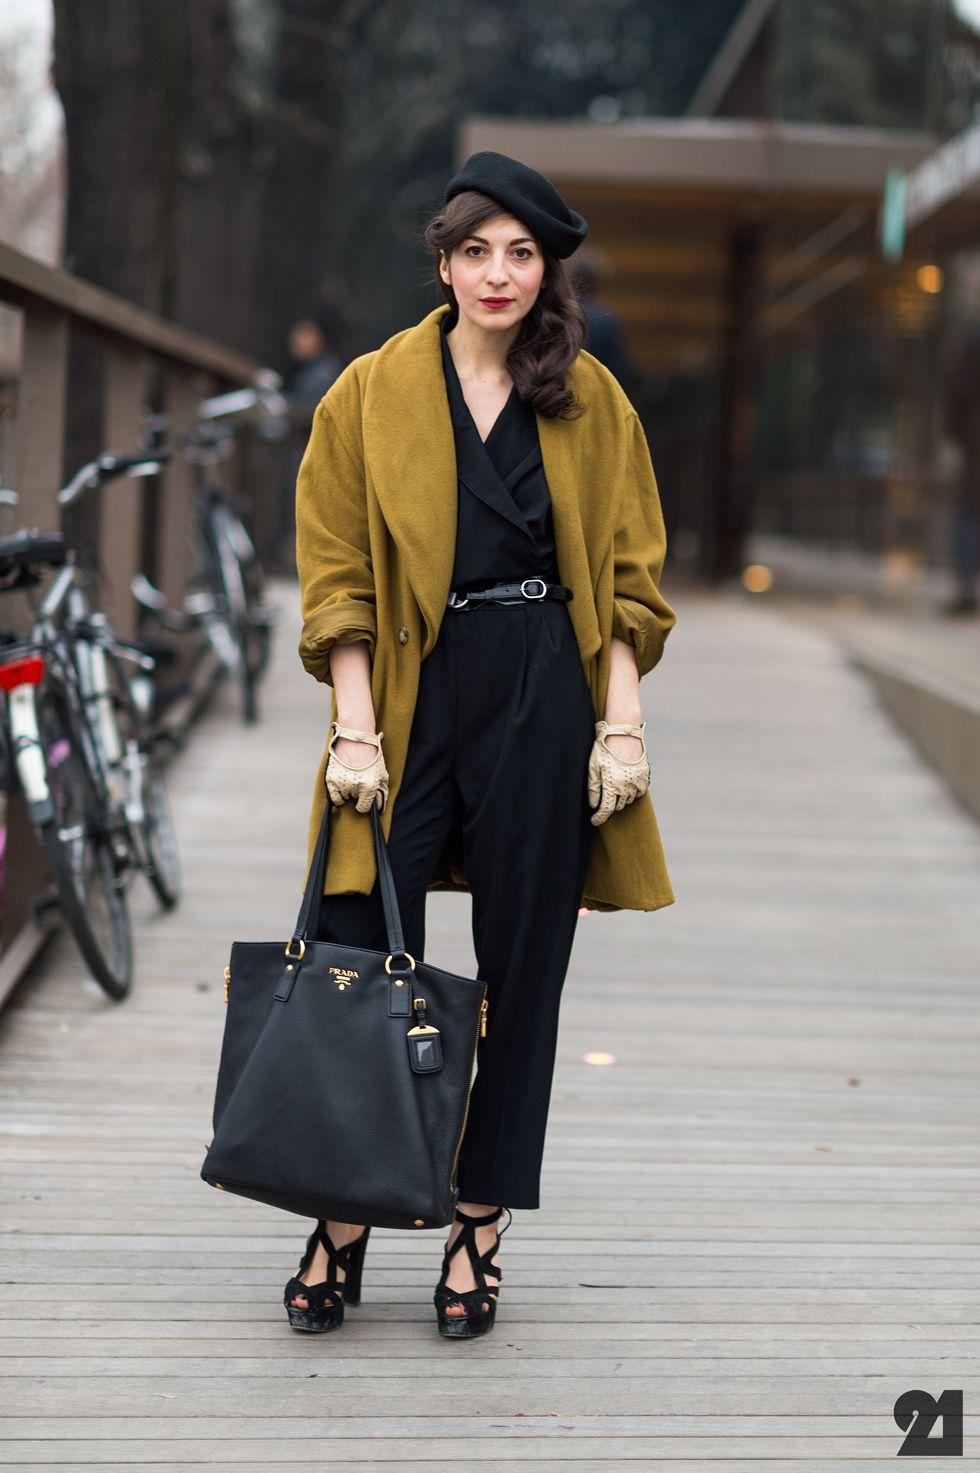 Italian-Woman-Black-Yellow-Streetstyle | I'd Wear That ... | 980 x 1473 jpeg 137kB